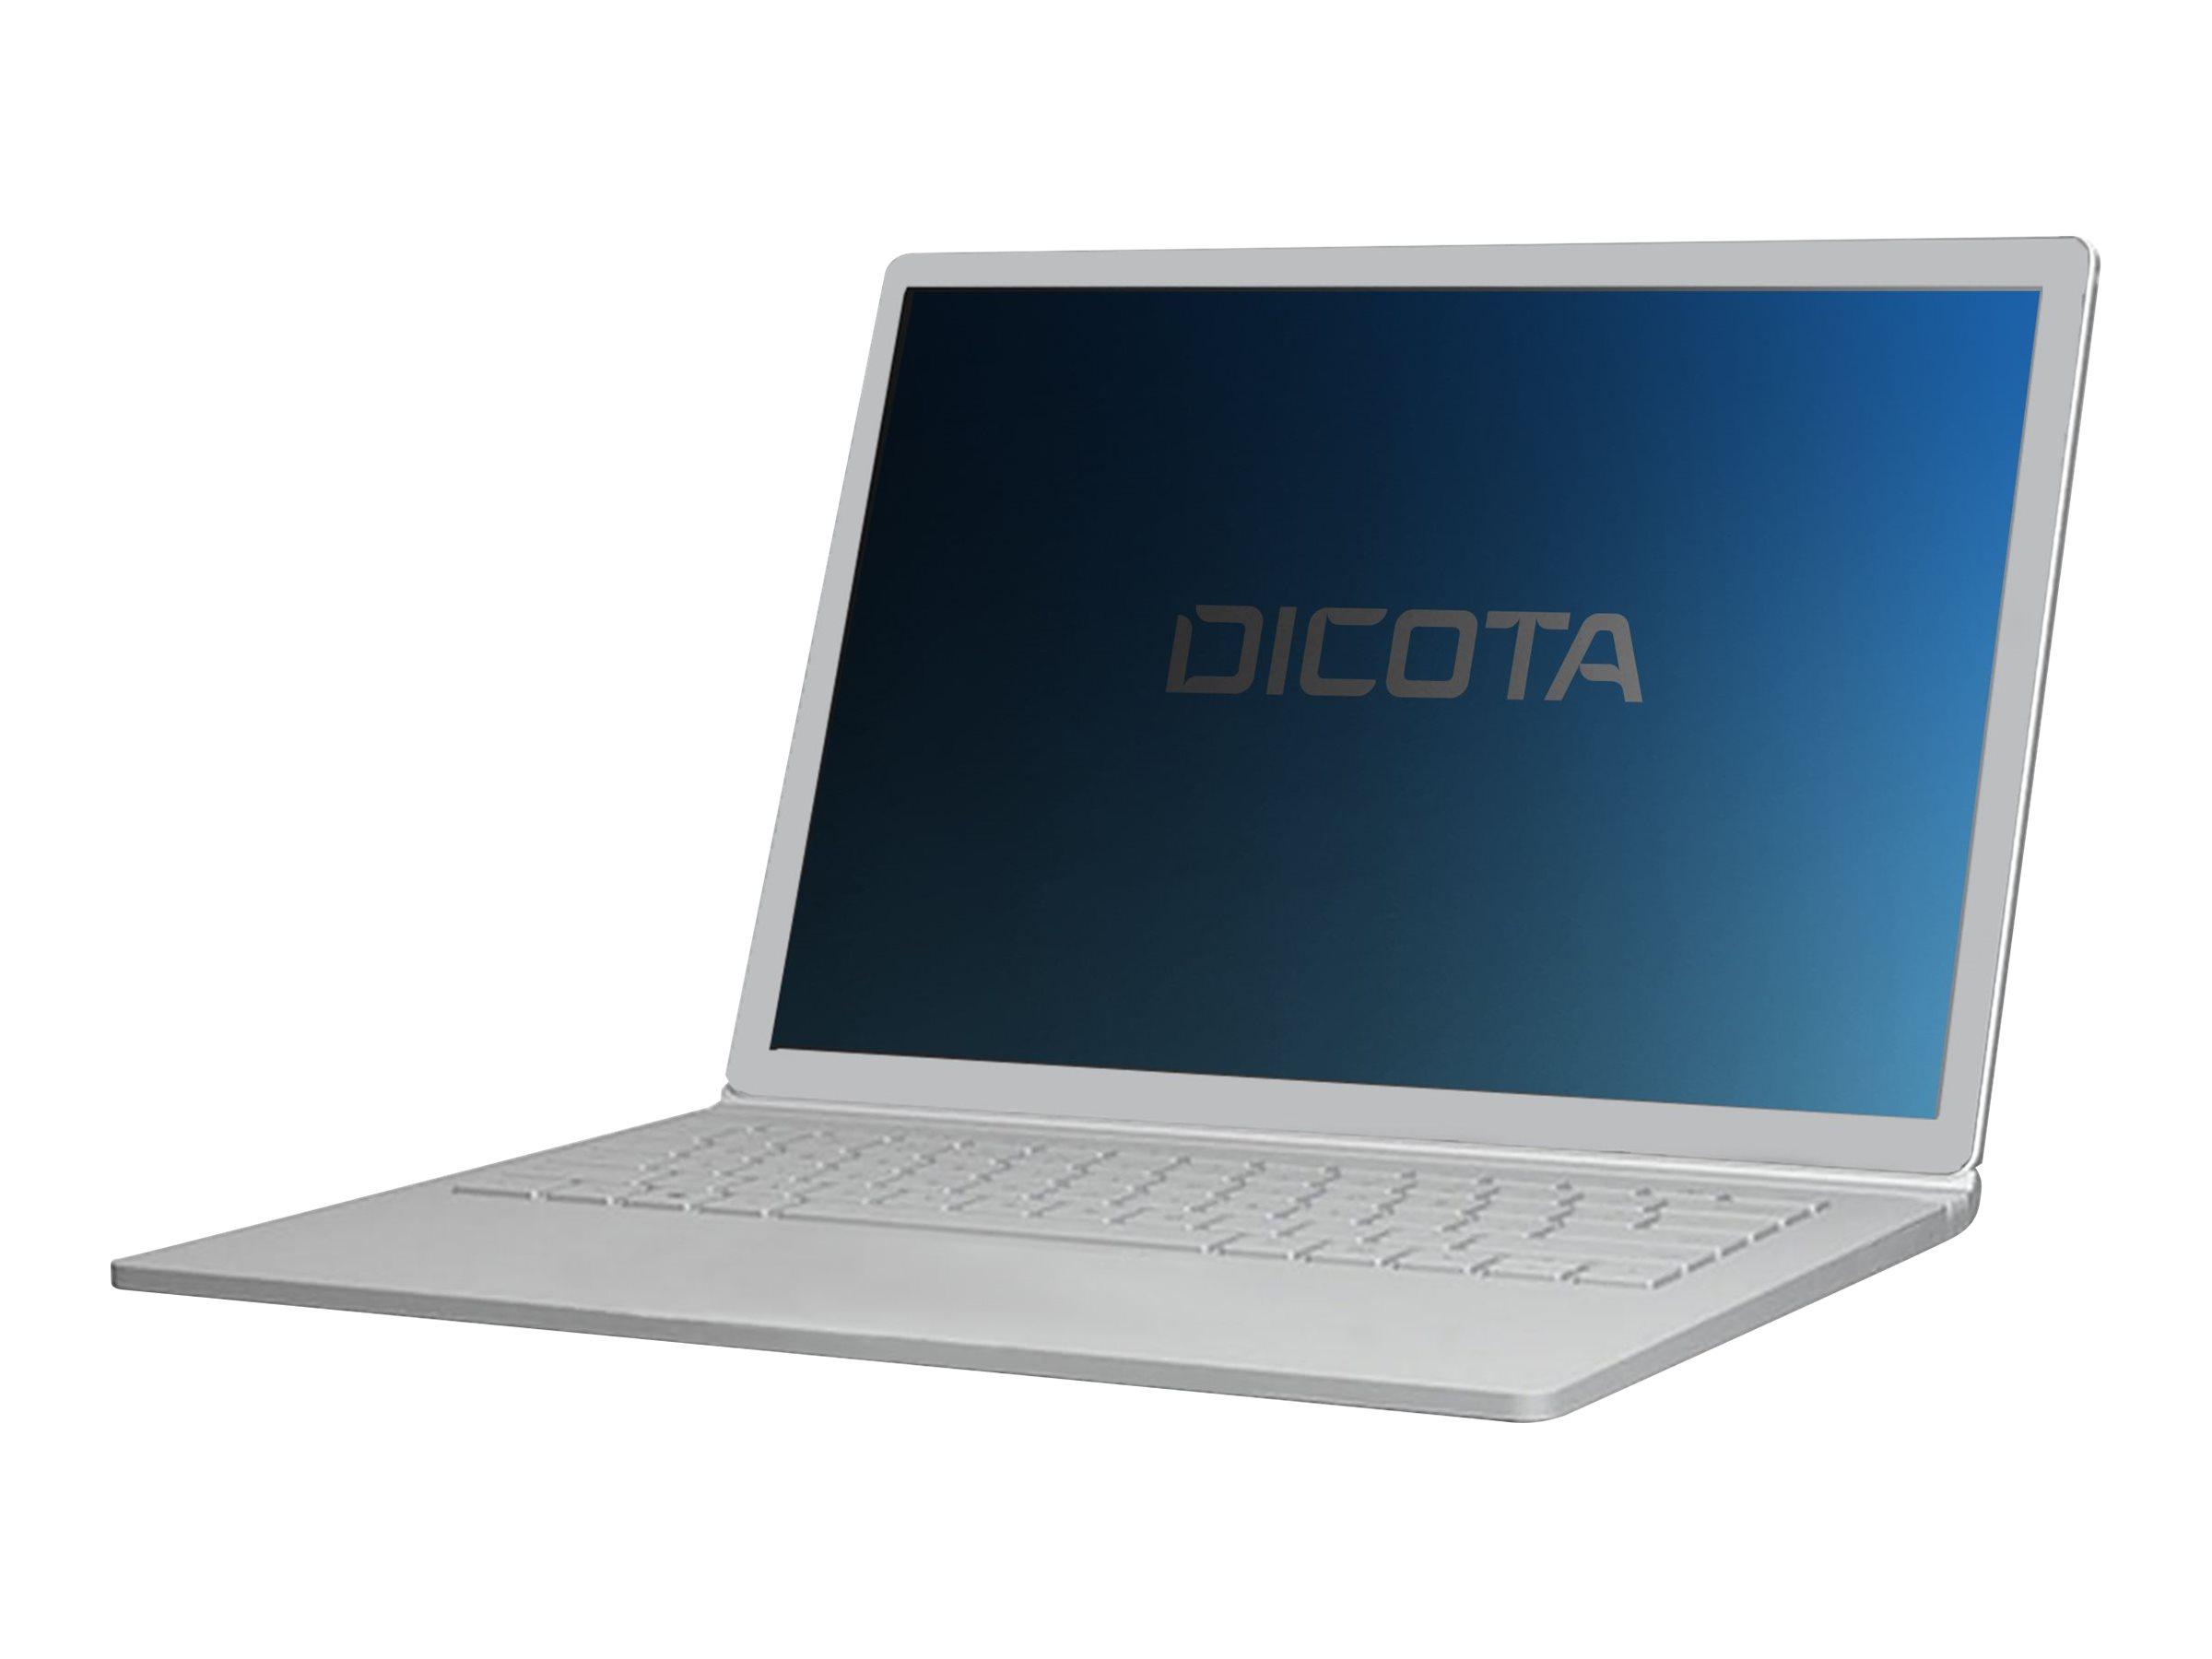 "Vorschau: Dicota Secret - Blickschutzfilter für Notebook - 4-Wege - Plug-in - 35.6 cm (14"")"